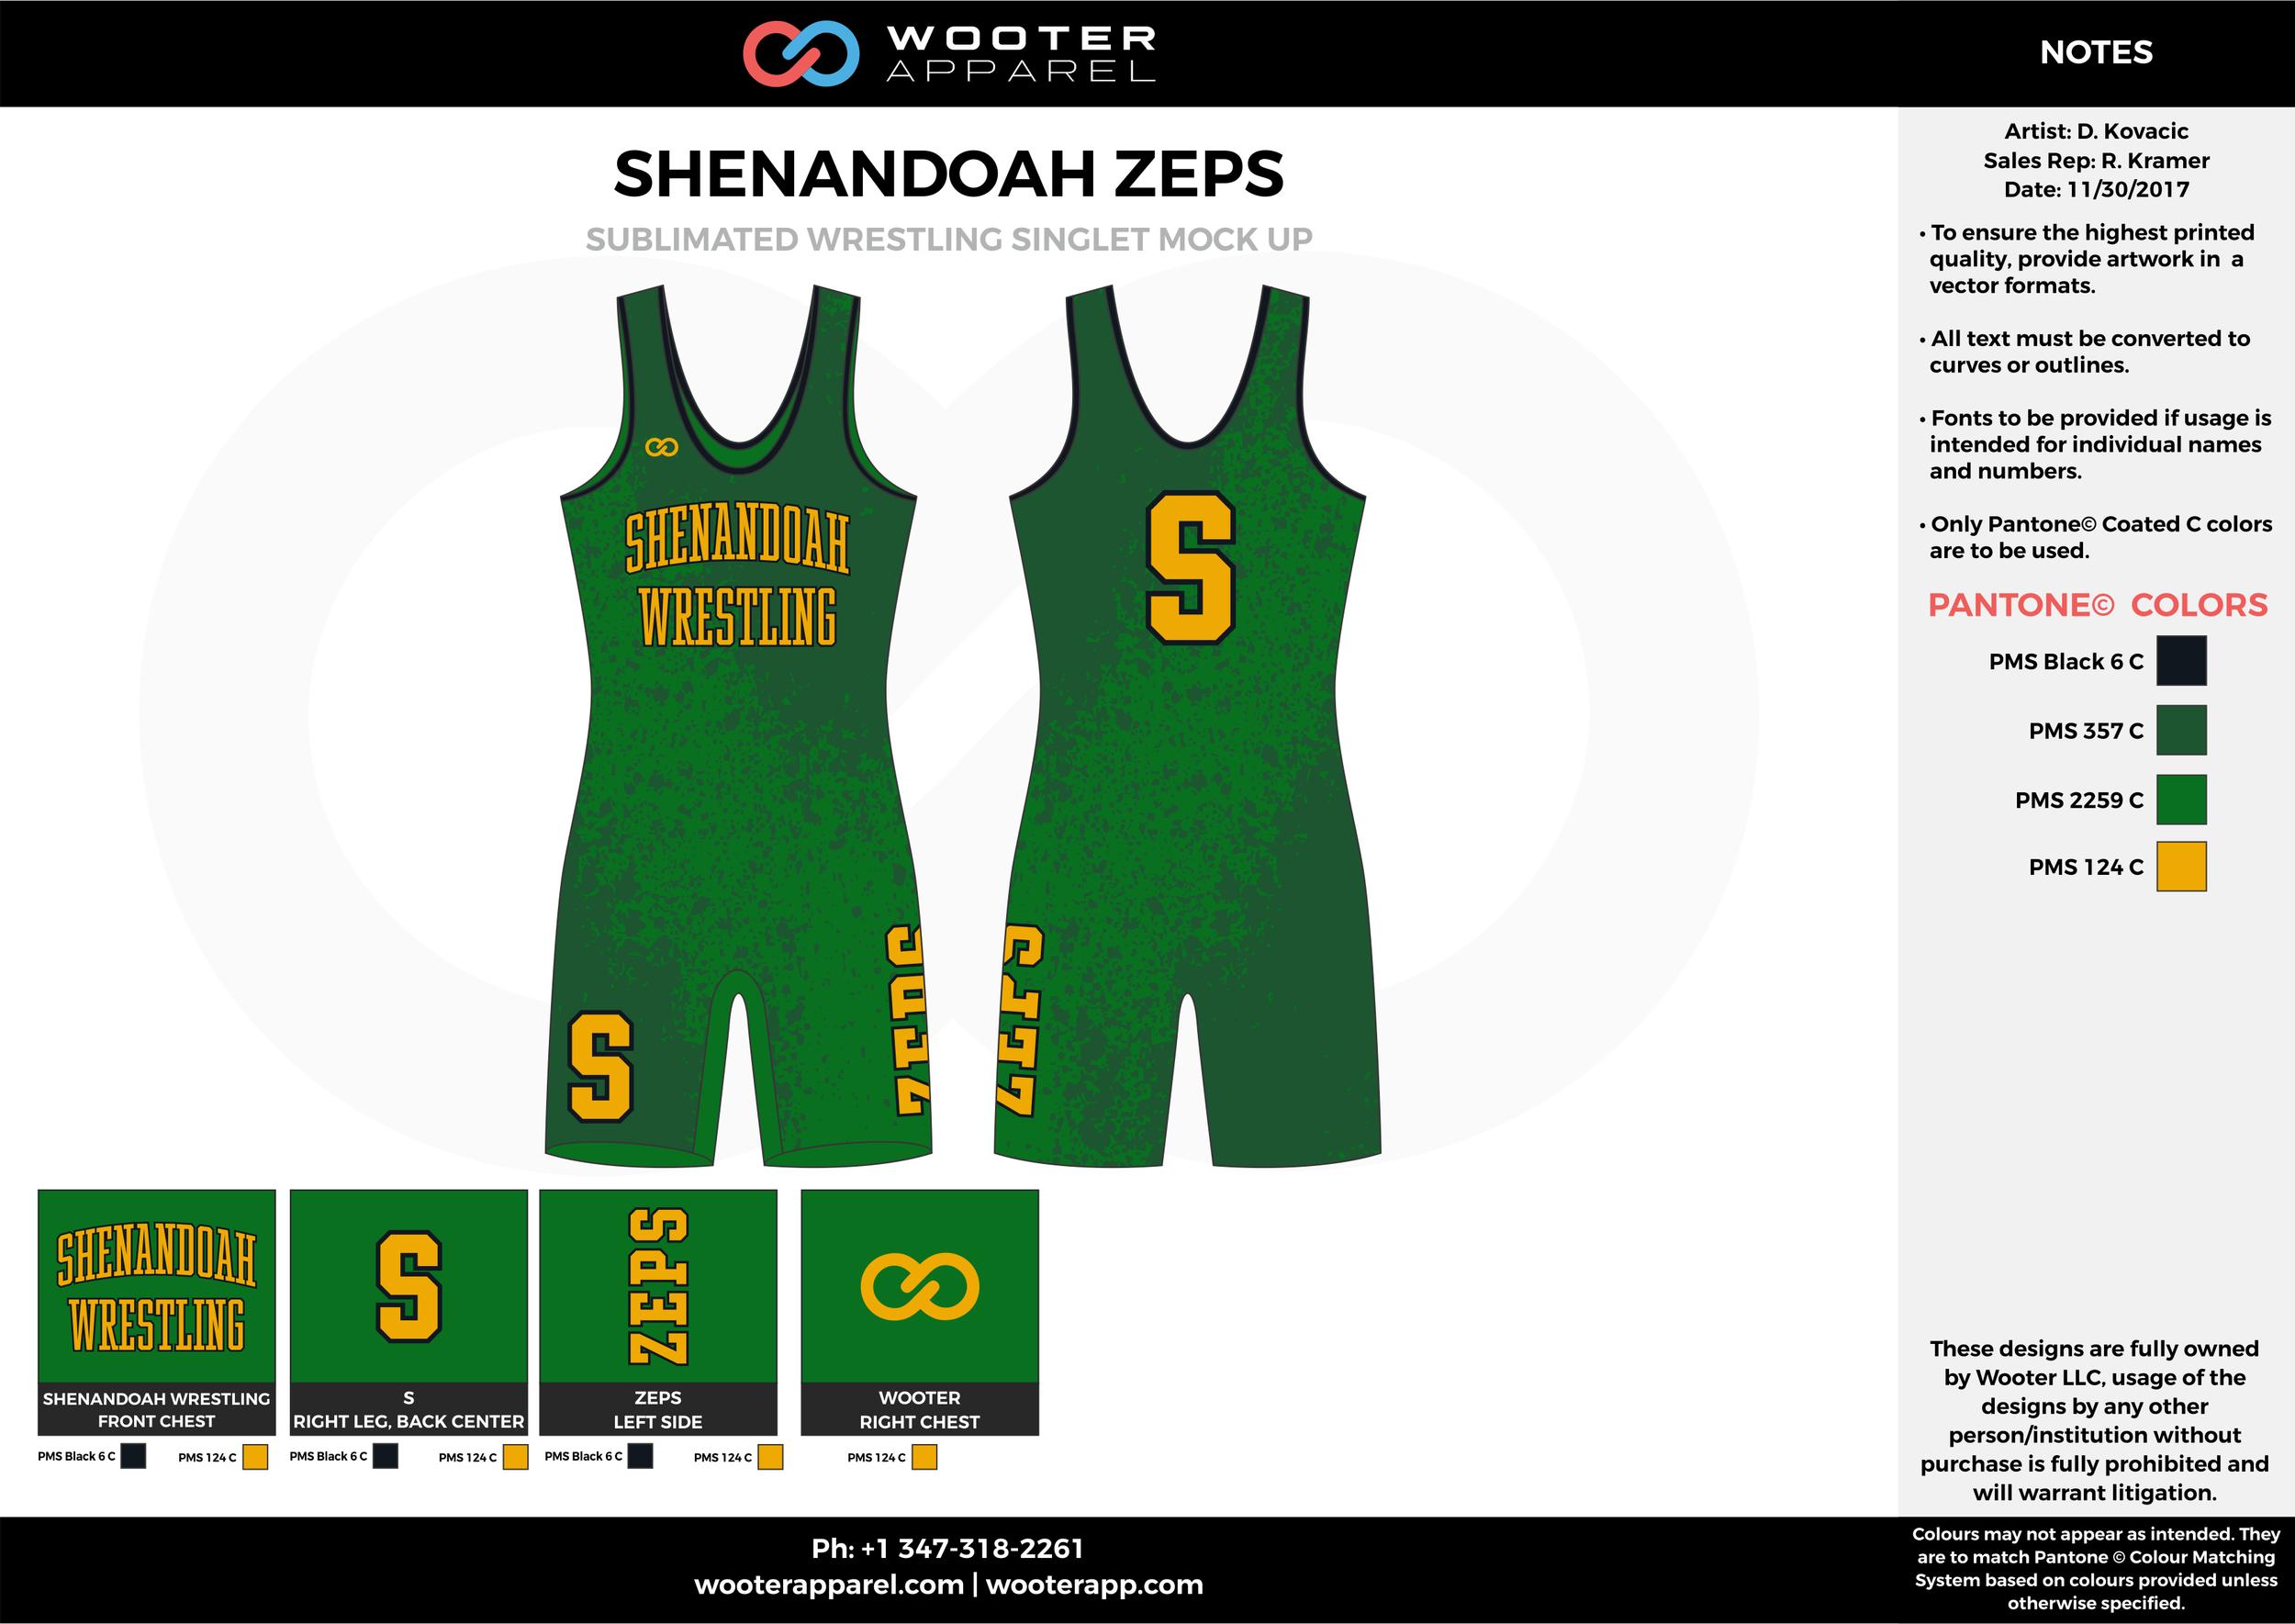 SHENANDOAH ZEPS Green Yellow Sublimated Wrestling Singlet